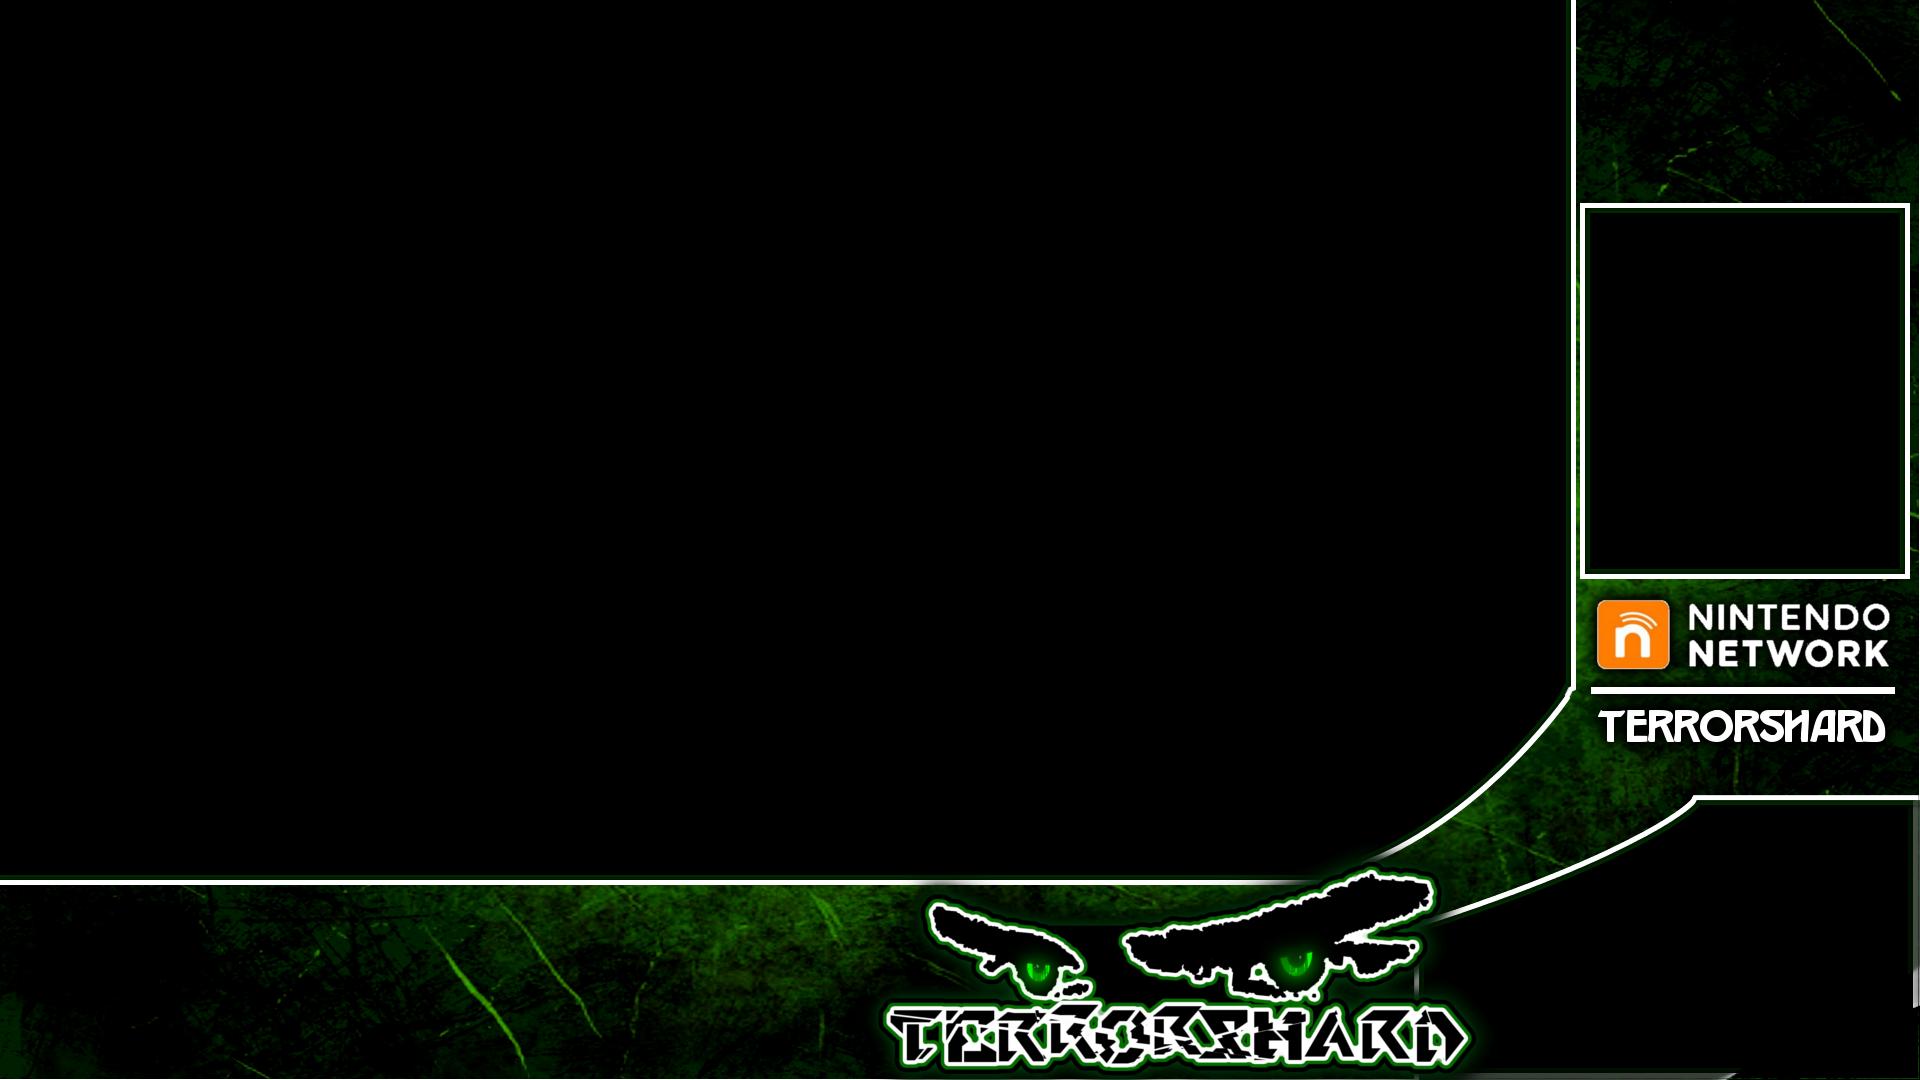 TerrorshardOverlay.png